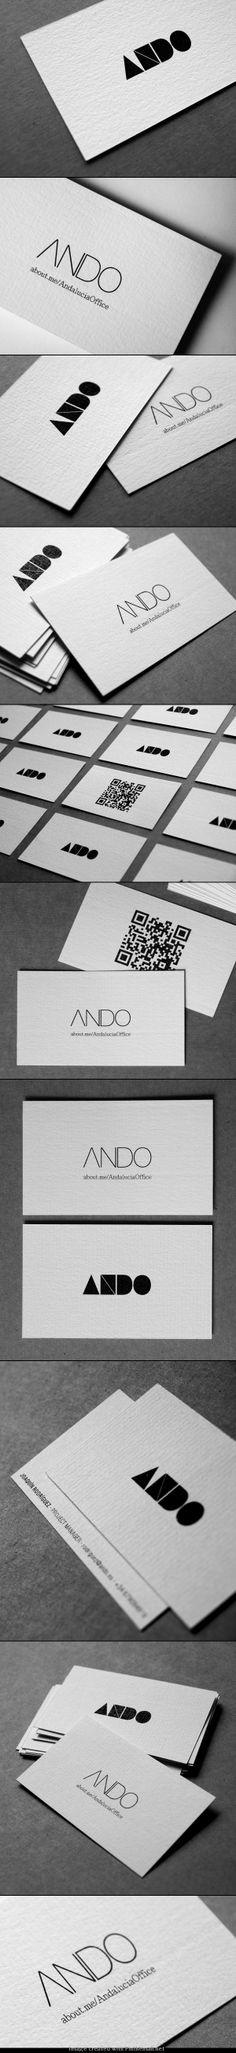 ANDO | brand identity http://www.behance.net/gallery/ANDO-Brand-Identity/3487721